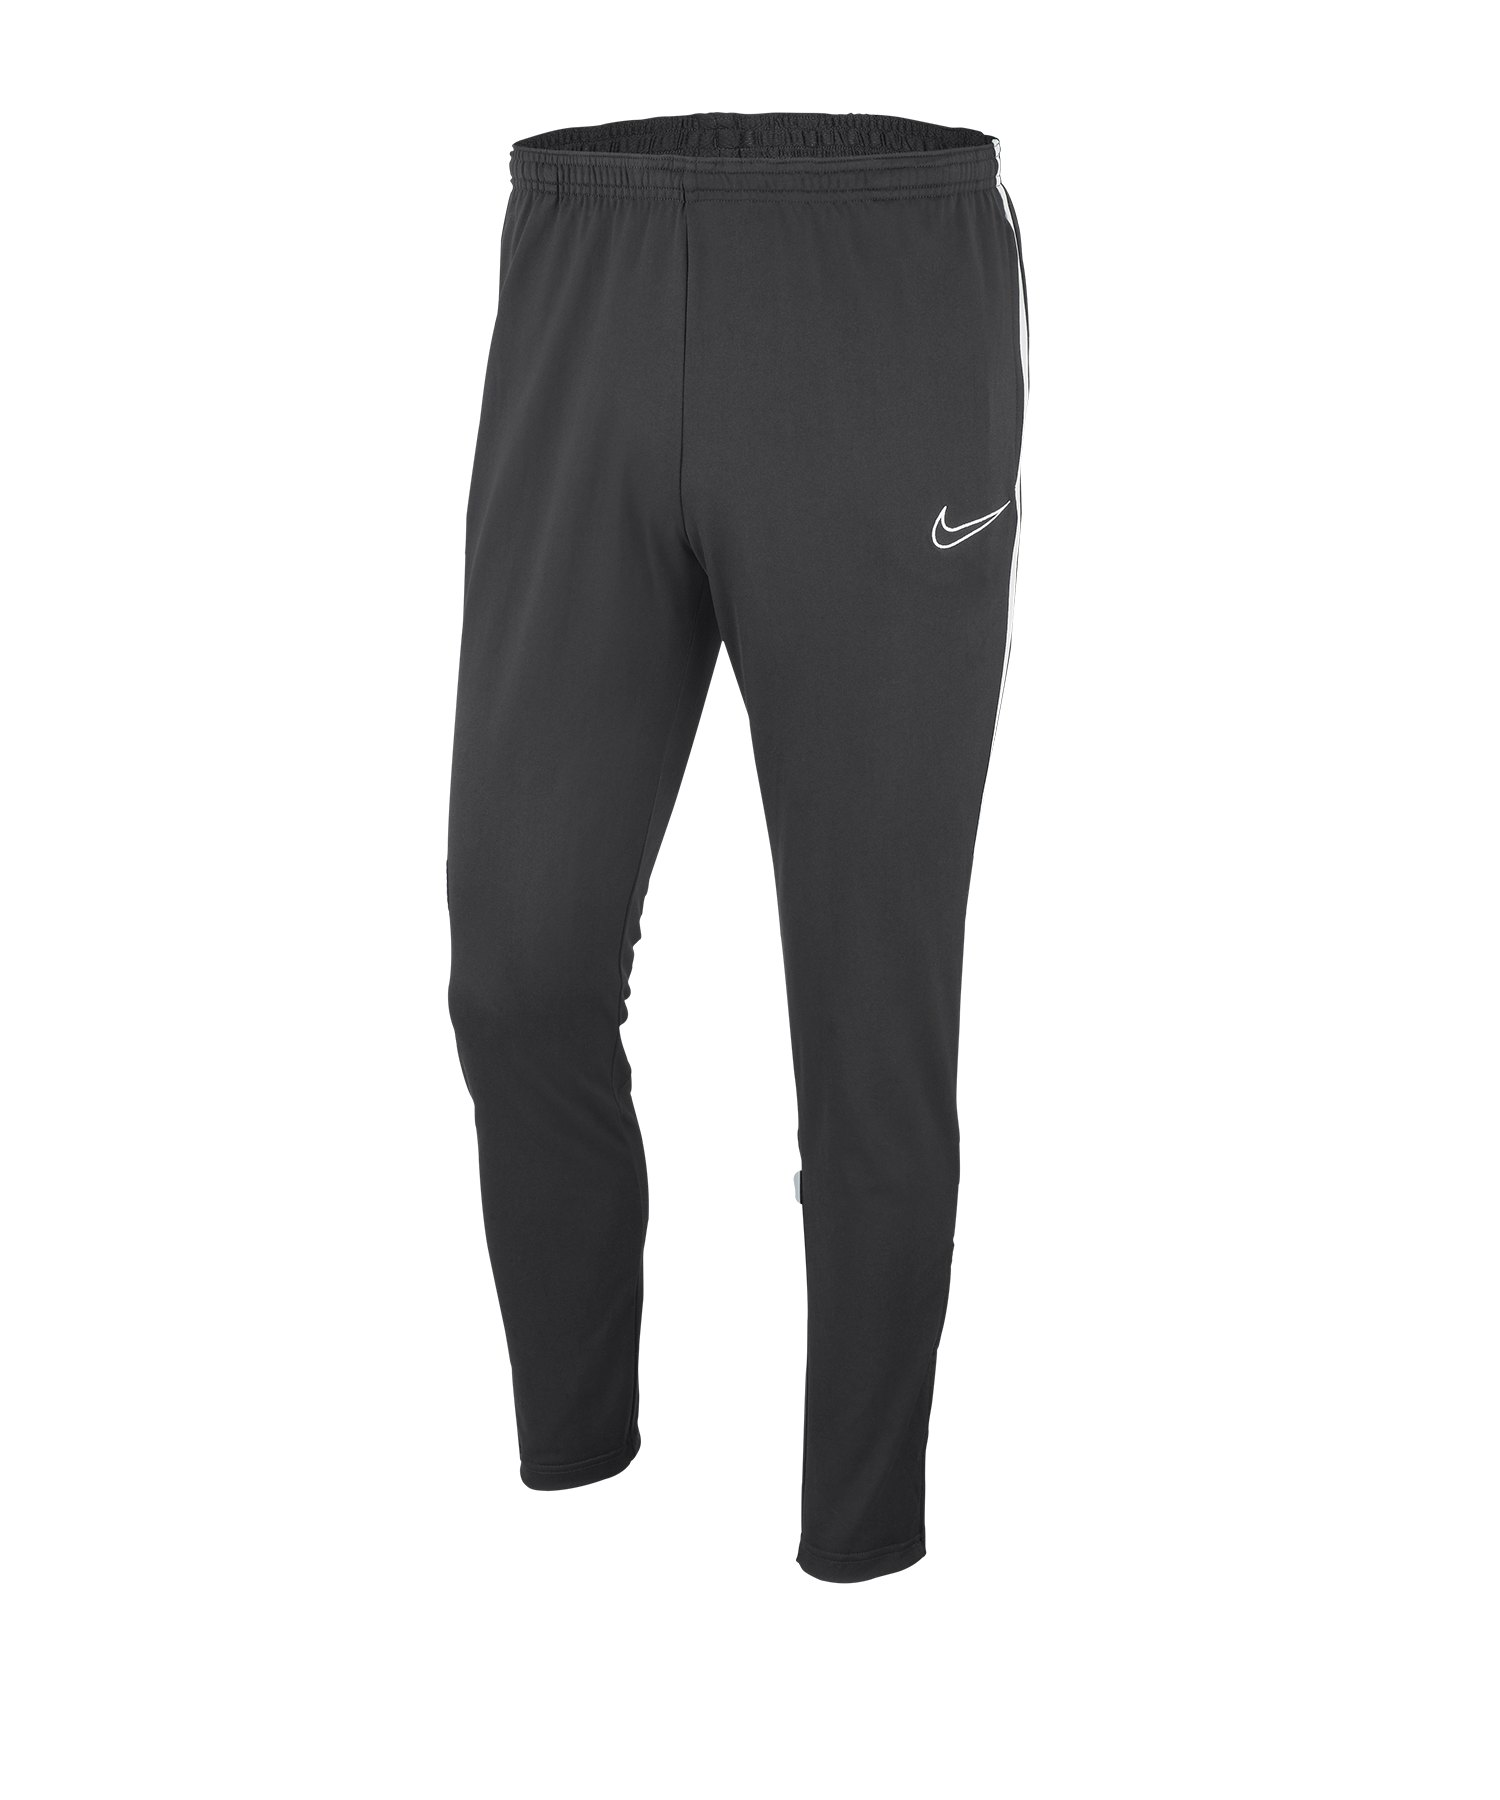 Nike Academy 19 Trainingshose Grau F060 - grau